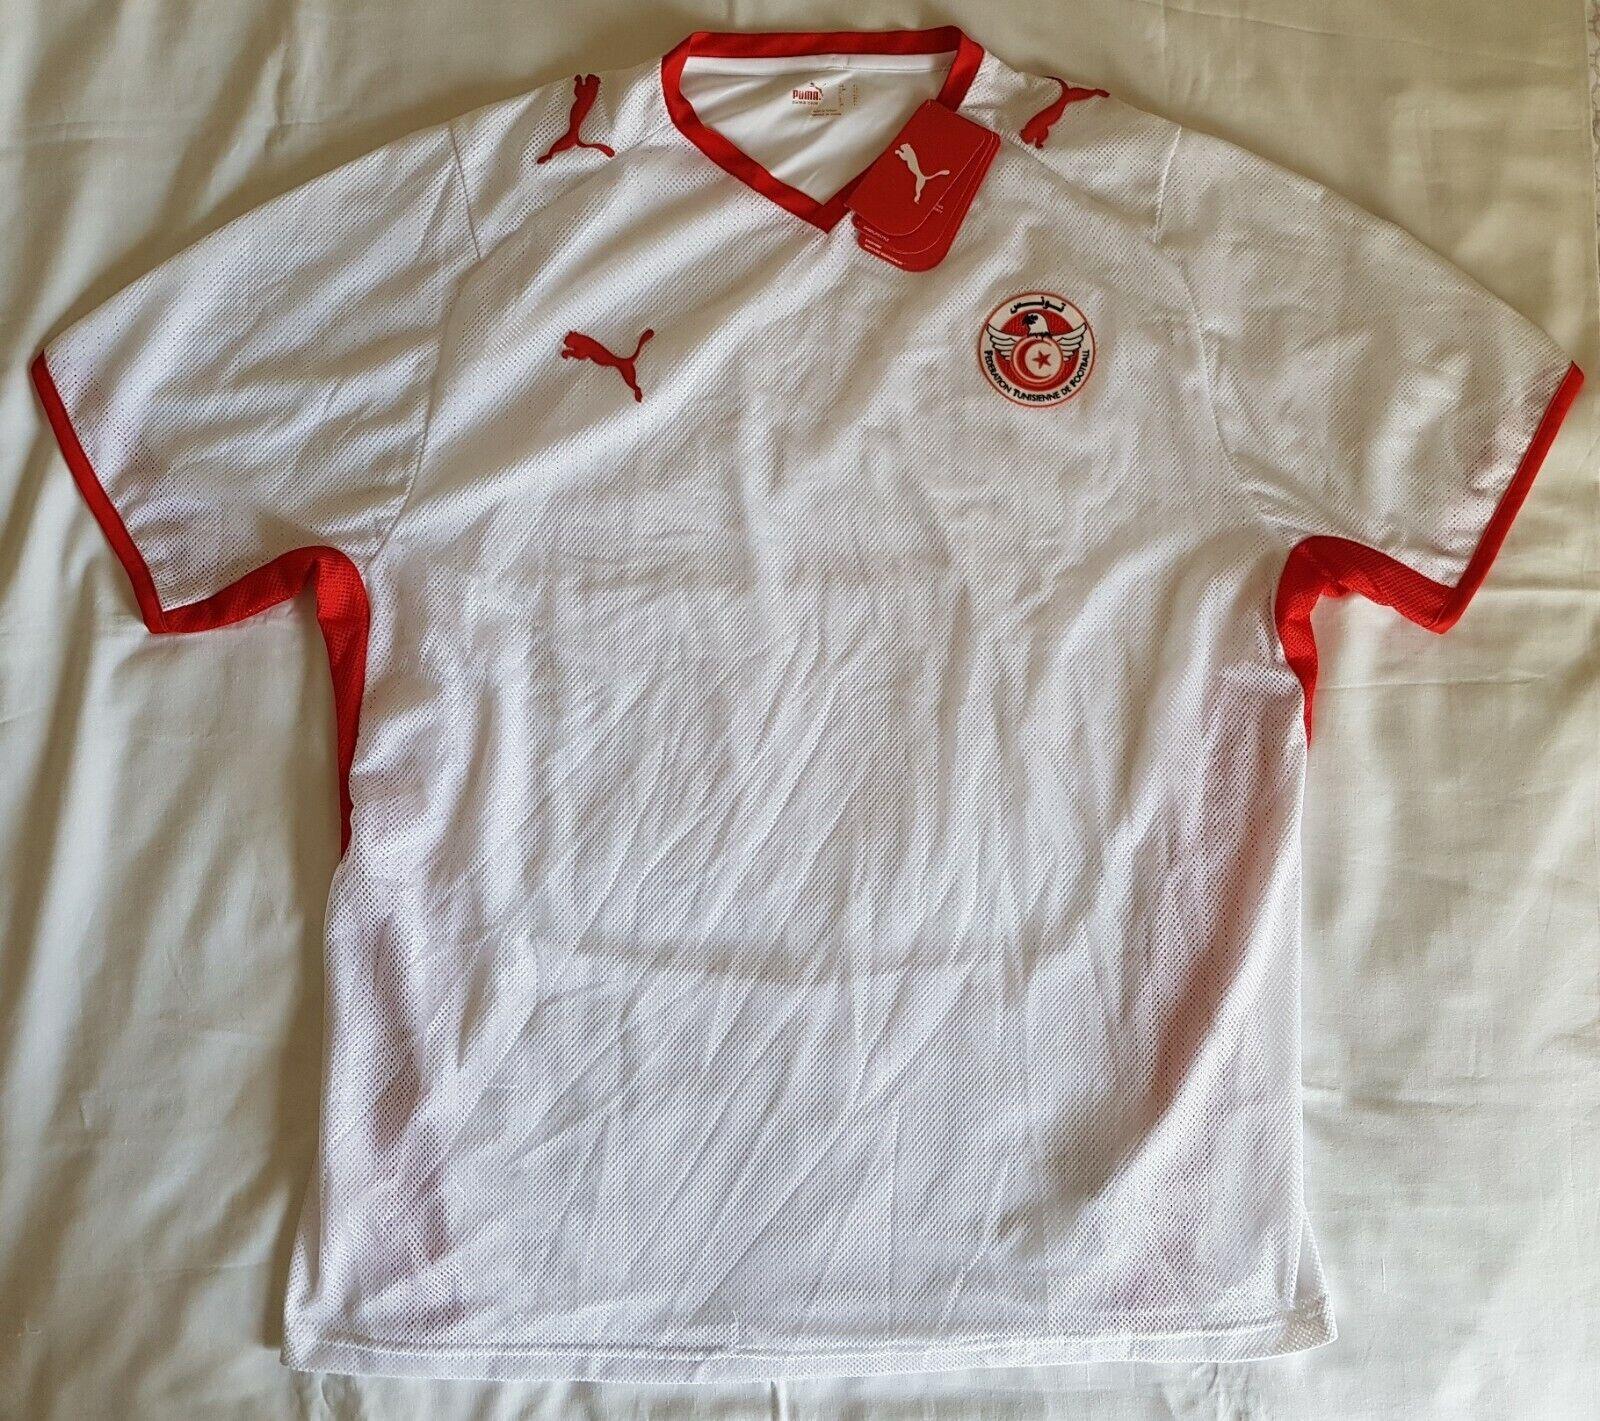 62ea3189c Tunisia 2008 - 2009 home football shirt soccer jersey